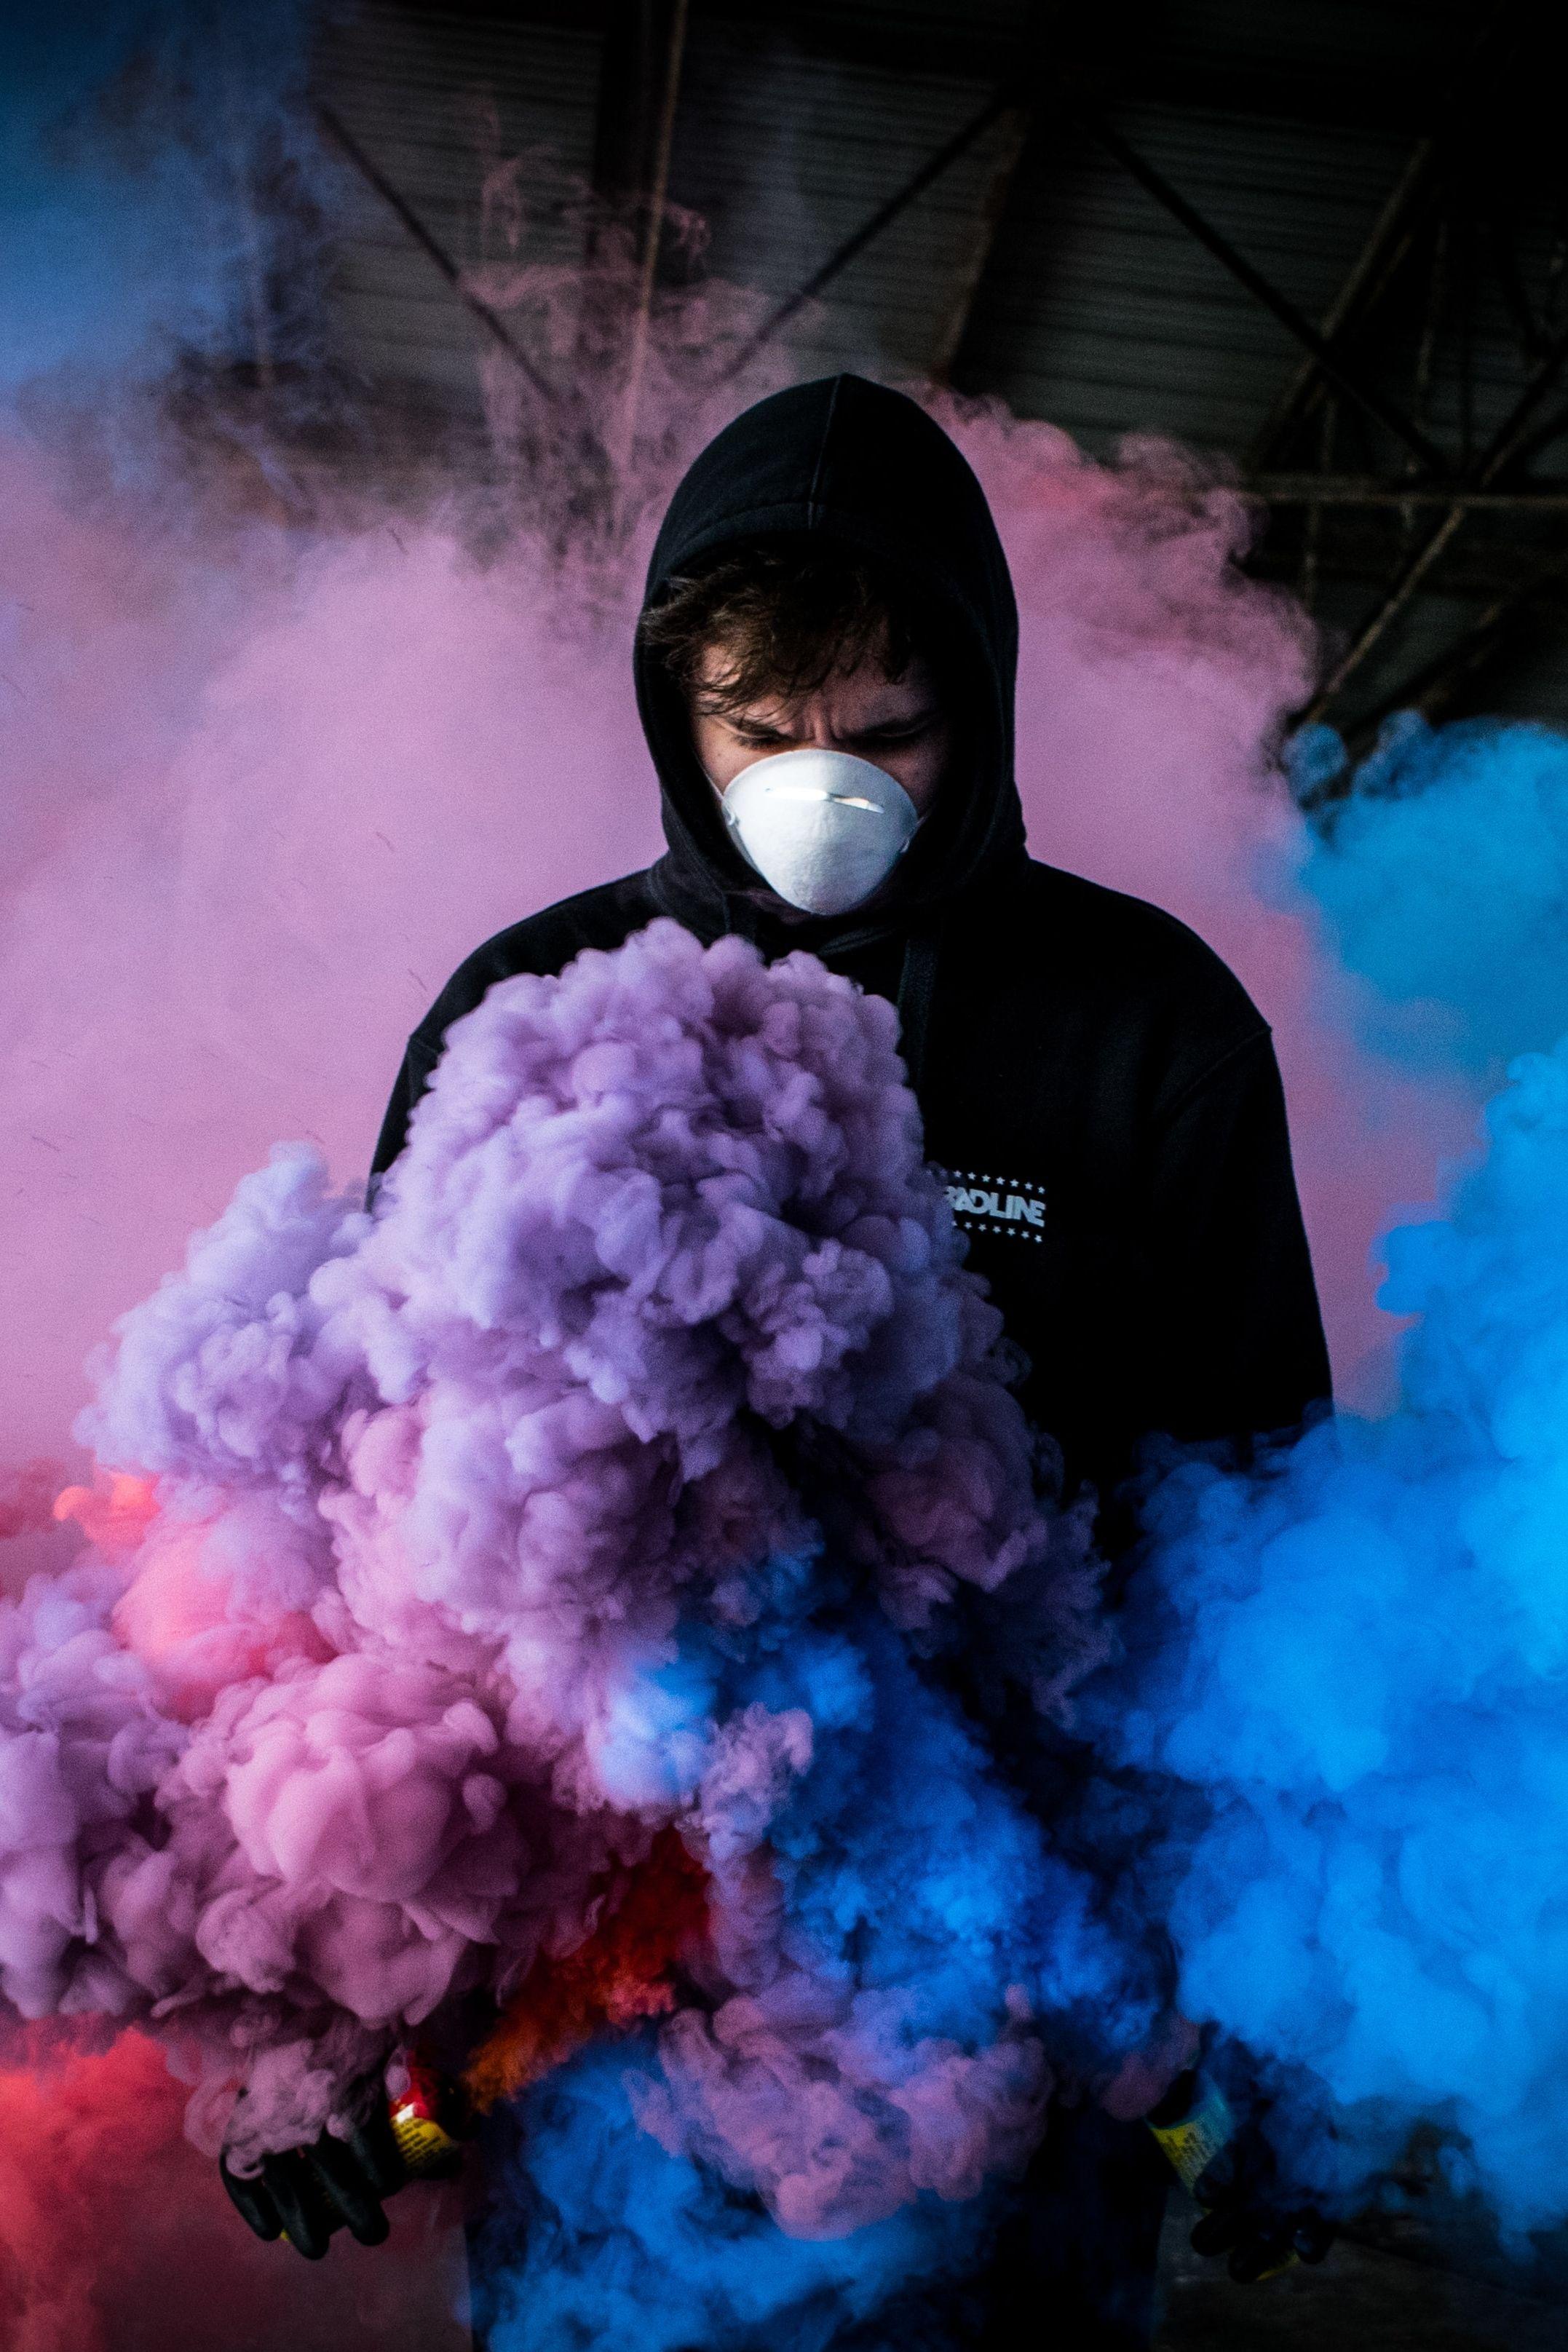 Urbex People Wallpaper Smoke Bomb Photography Colored Smoke Smoke Bomb